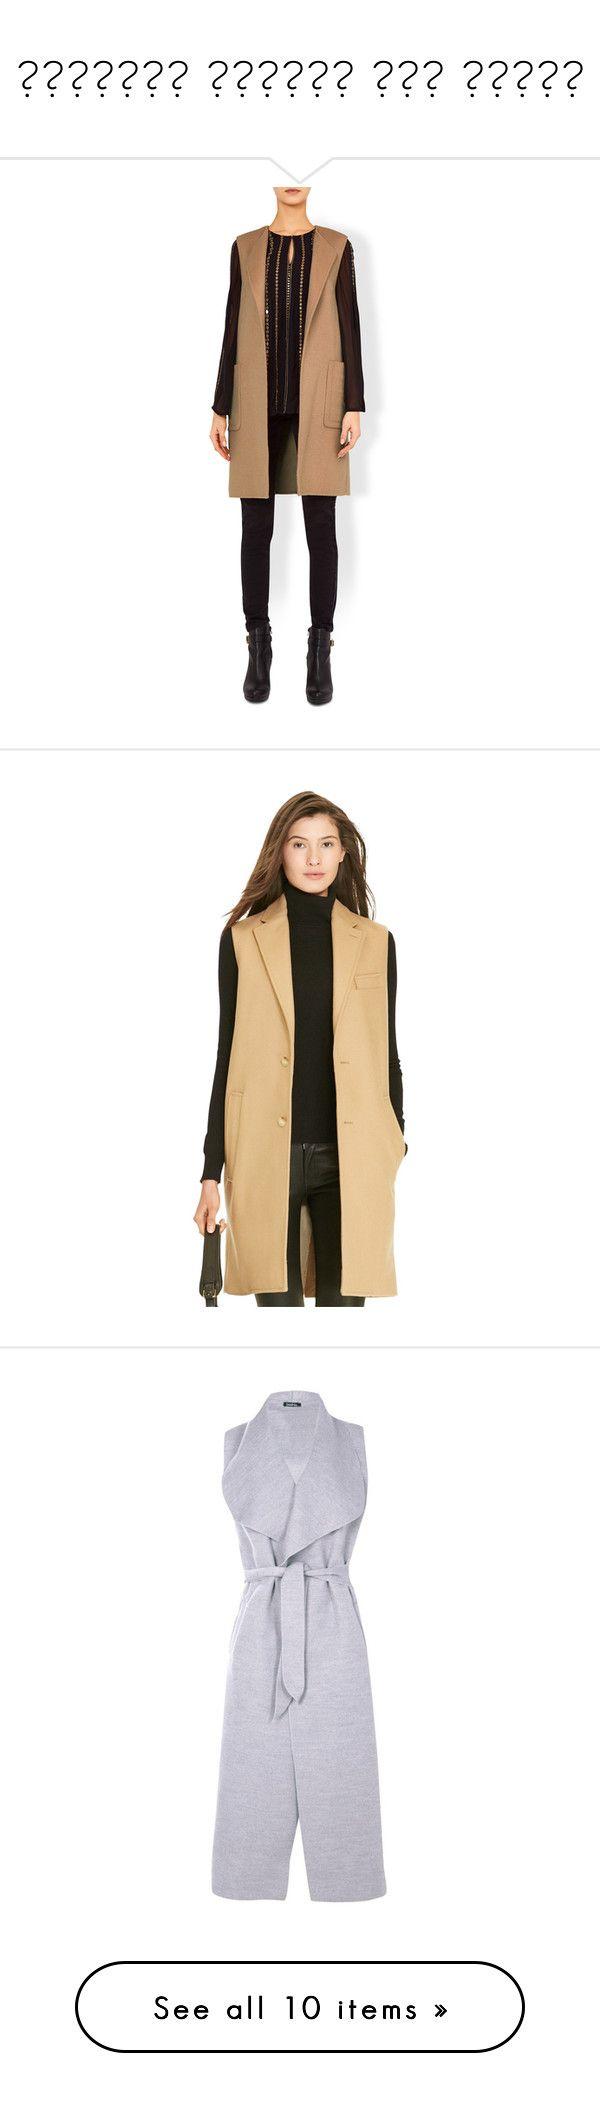 """Длинные жилеты для Ксюши"" by elena-wolfin on Polyvore featuring outerwear, coats, camel coat, sleeveless coat, monsoon coats, reversible coat, polo ralph lauren, collar coat, polo ralph lauren coats и beige coat"